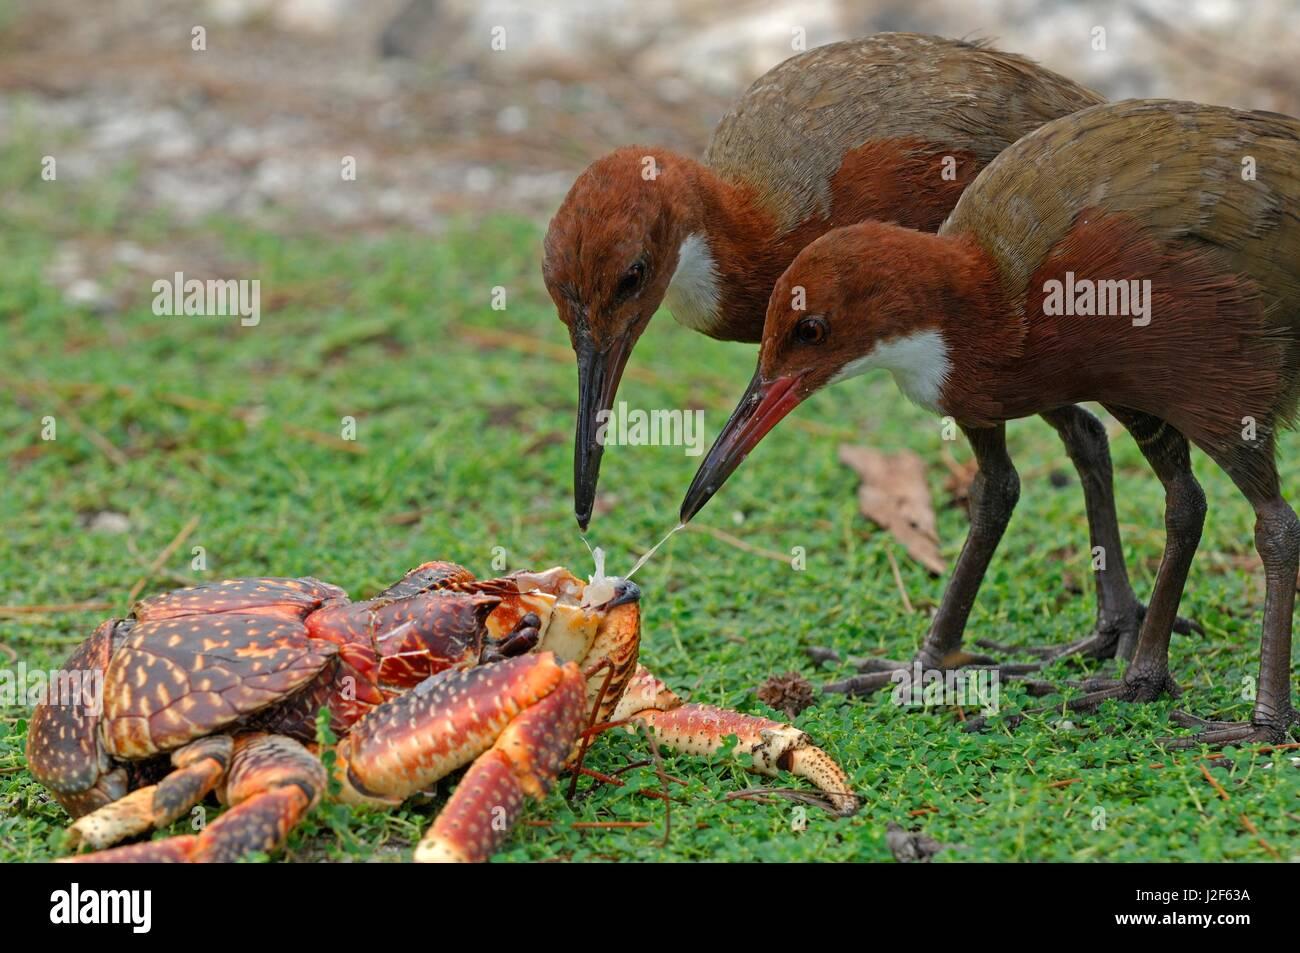 Aldabra White-throated Rail (Dryolimnas cuvieri aldabranus) foraging on freshly killed crab - Stock Image